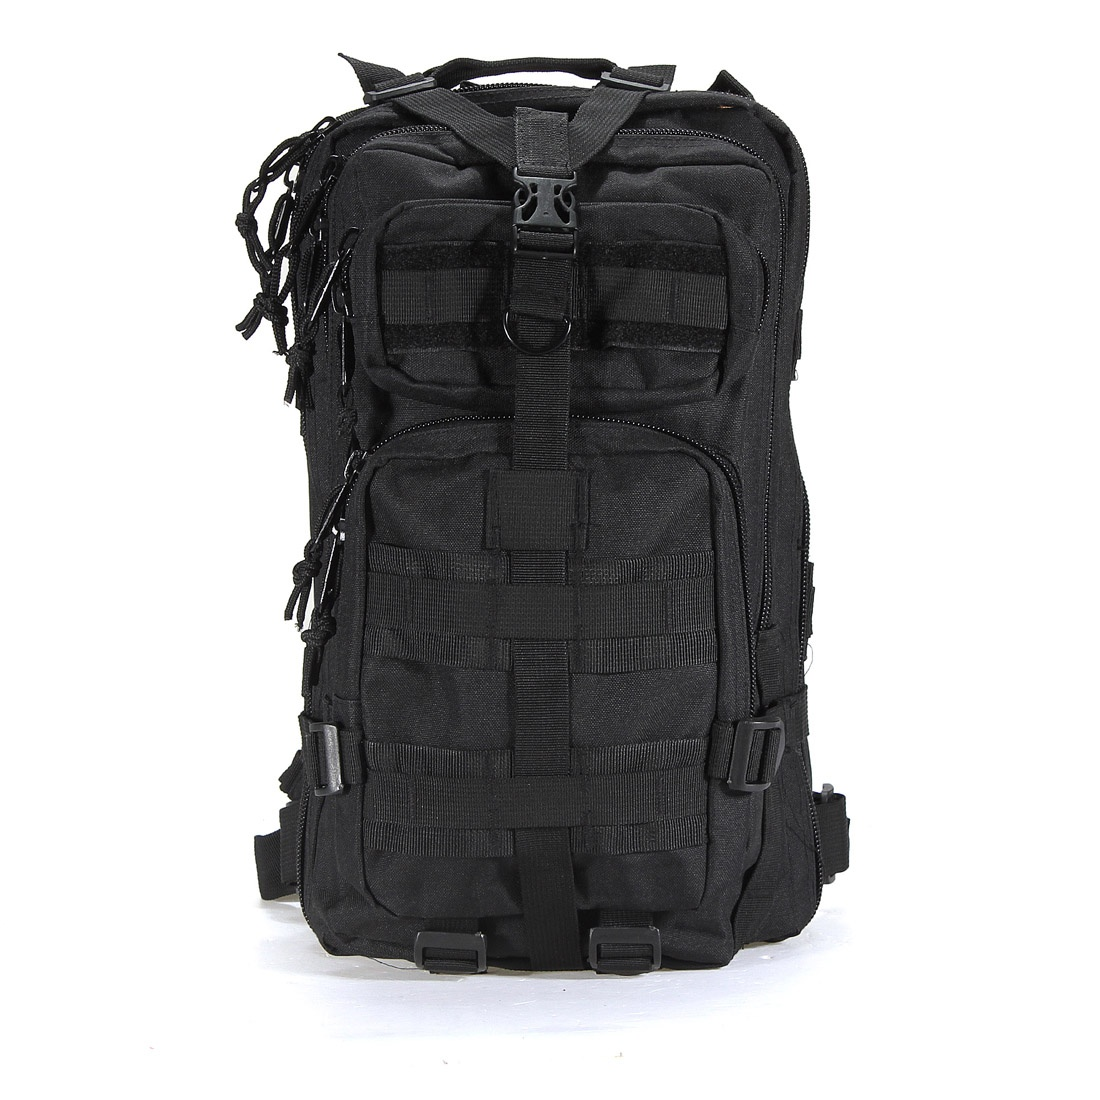 1000D Nylon 30L Waterproof Outdoor Military Rucksacks Tactical ... 92905fbf35208